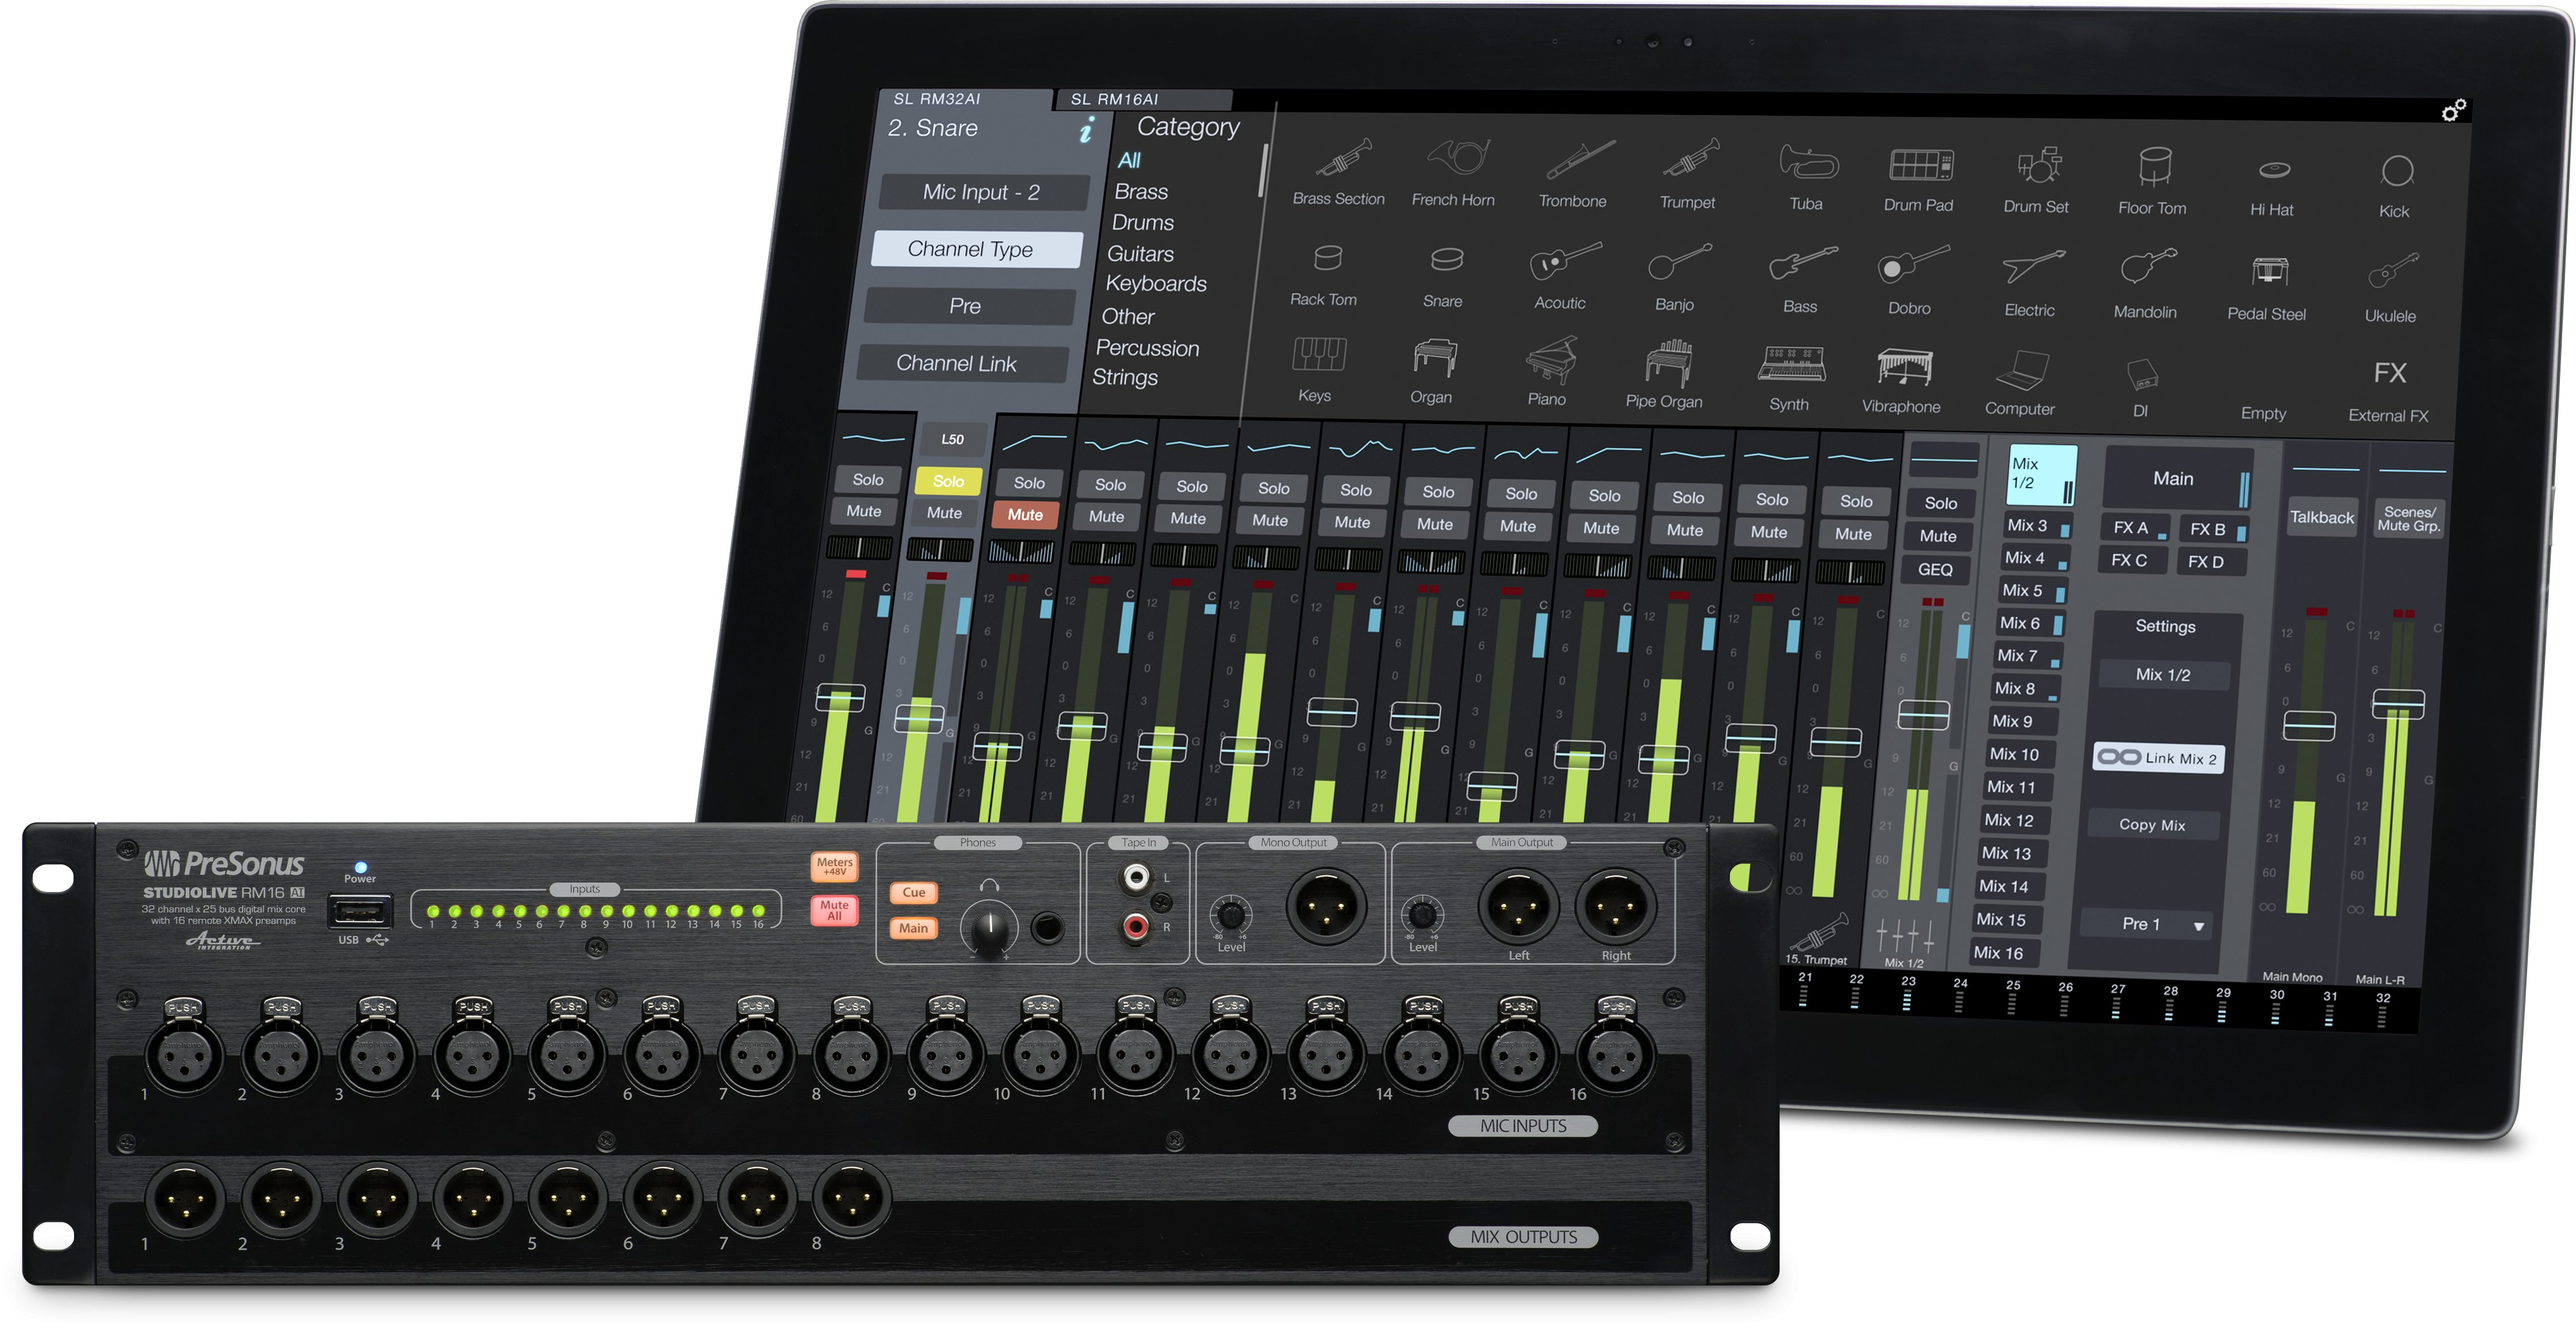 presonus studiolive rm16ai 16 channel rack mounted mixer. Black Bedroom Furniture Sets. Home Design Ideas